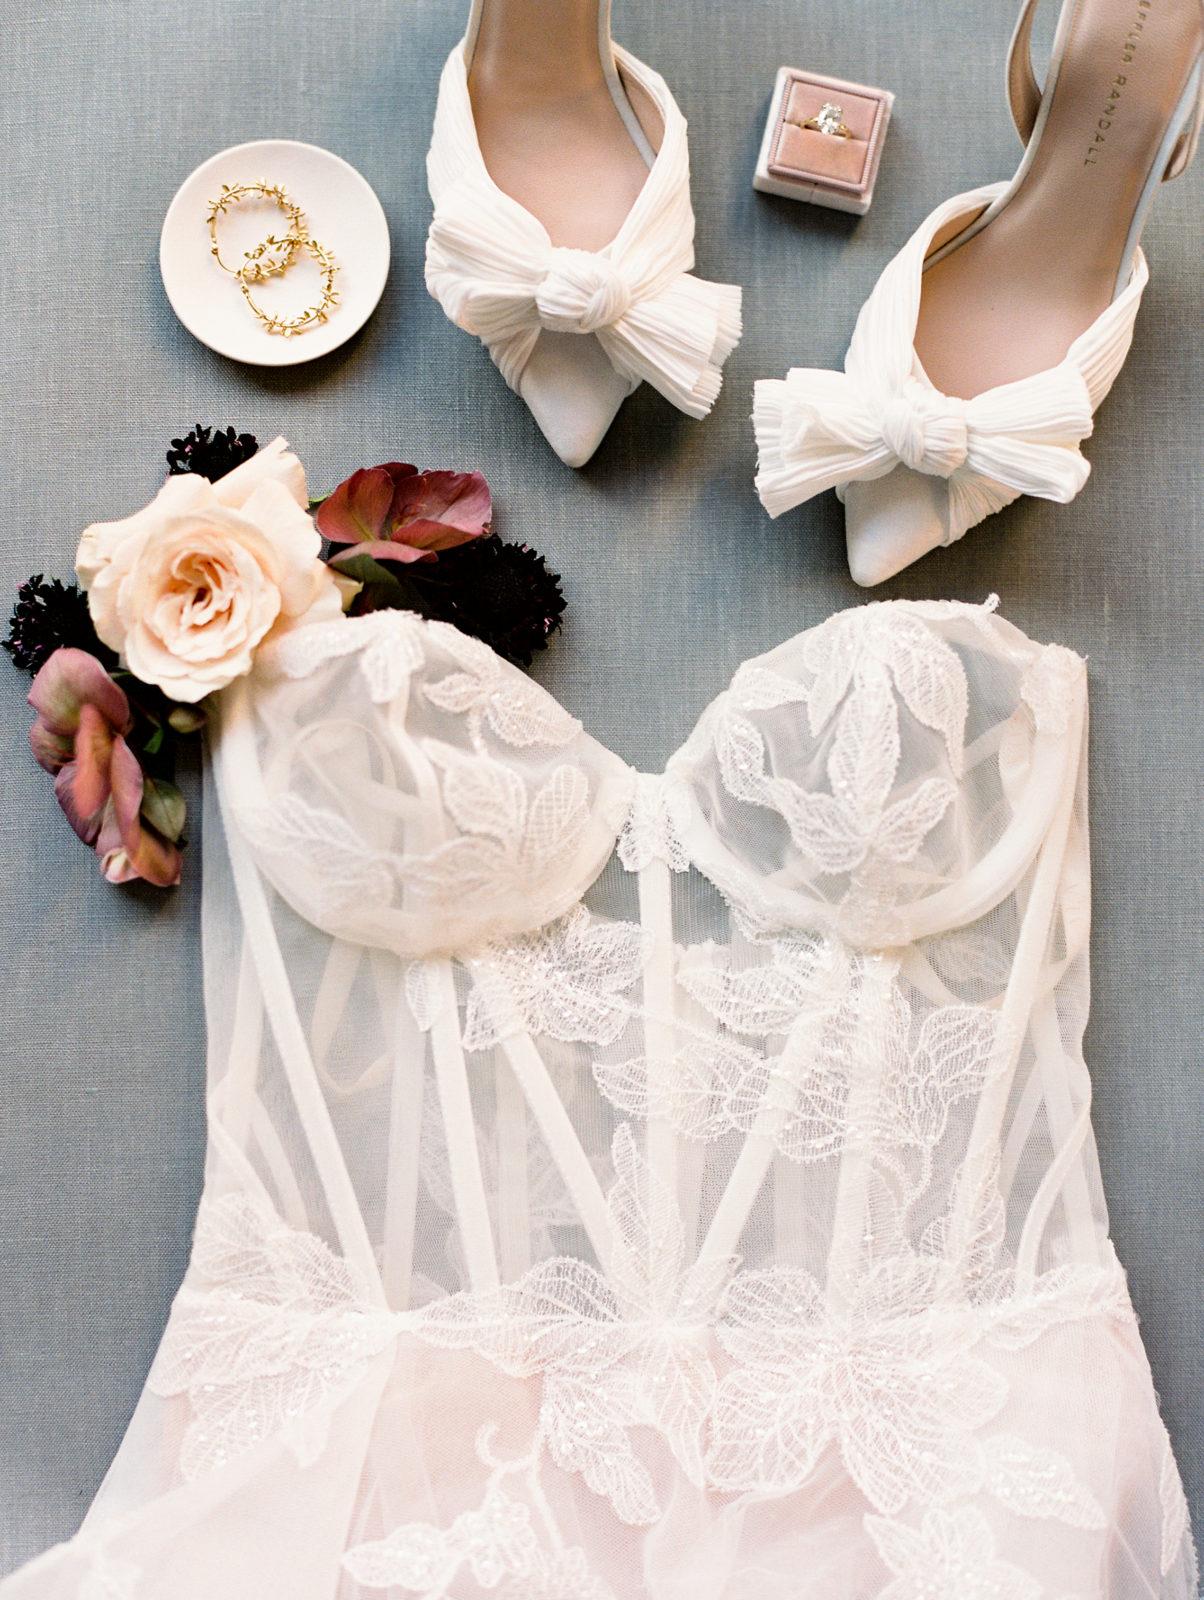 Galia Lahav Wedding Dress from Stanley Korshak Bridal Salon